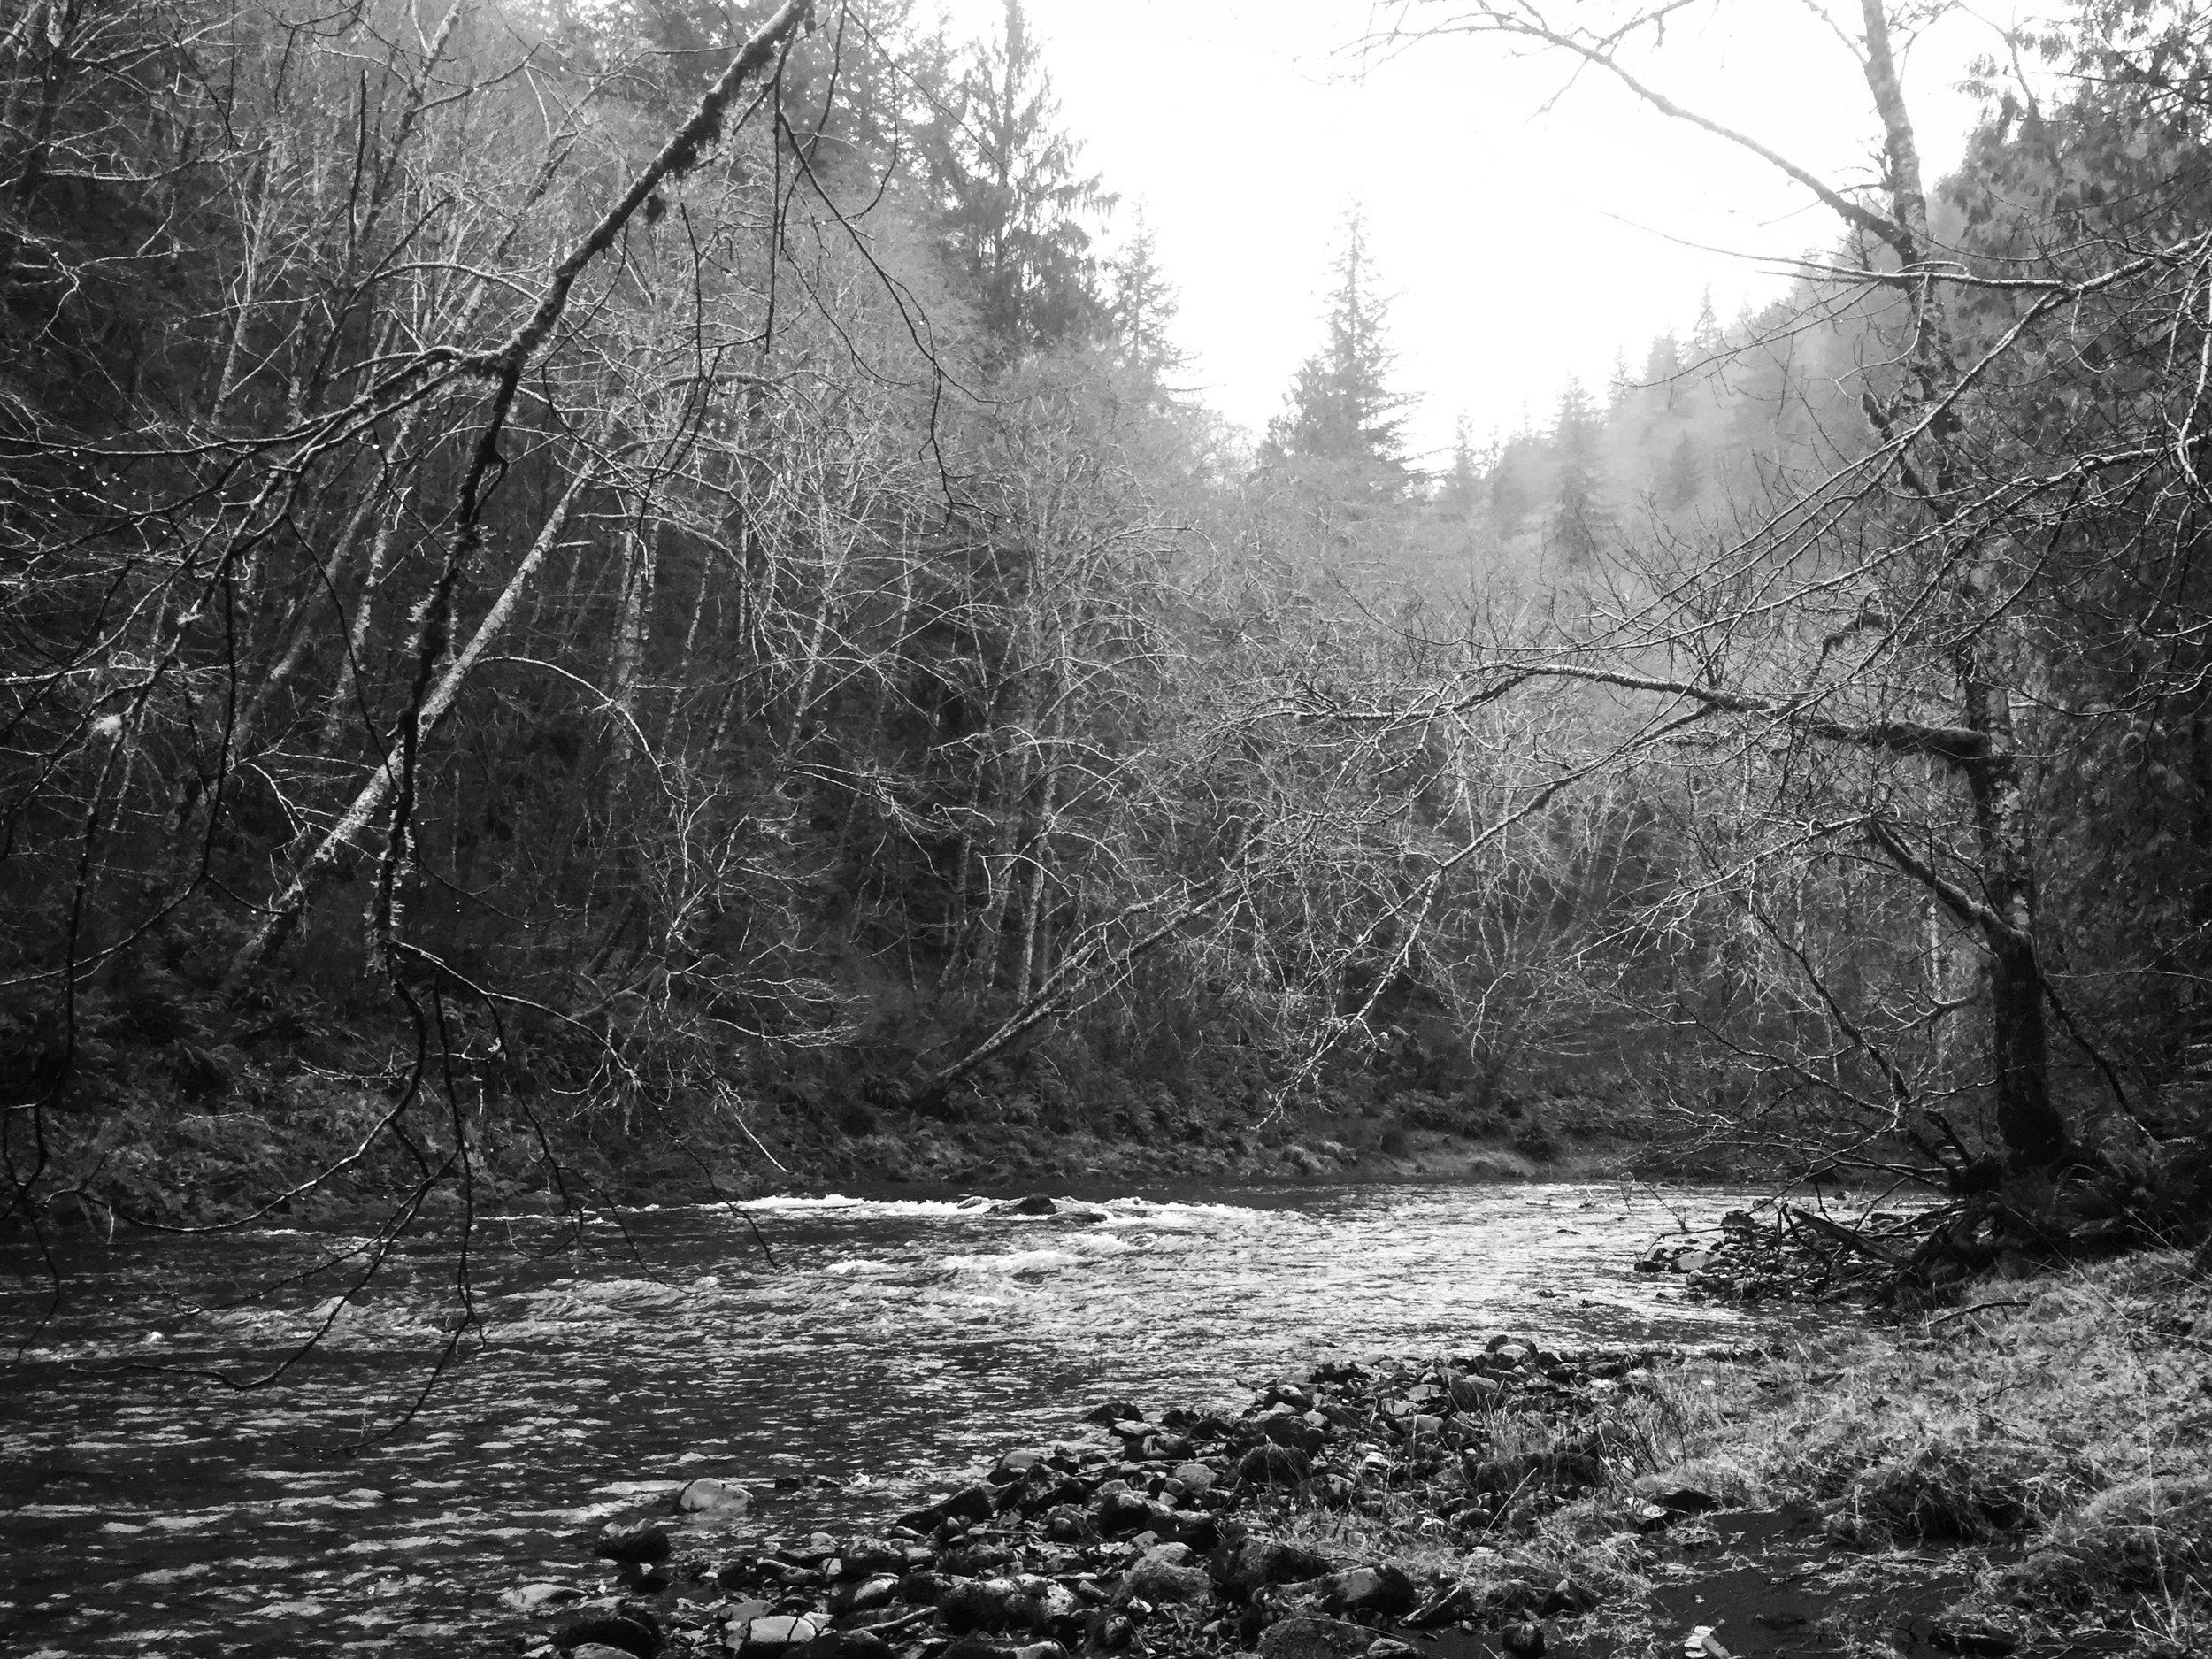 A coastal river in Oregon.